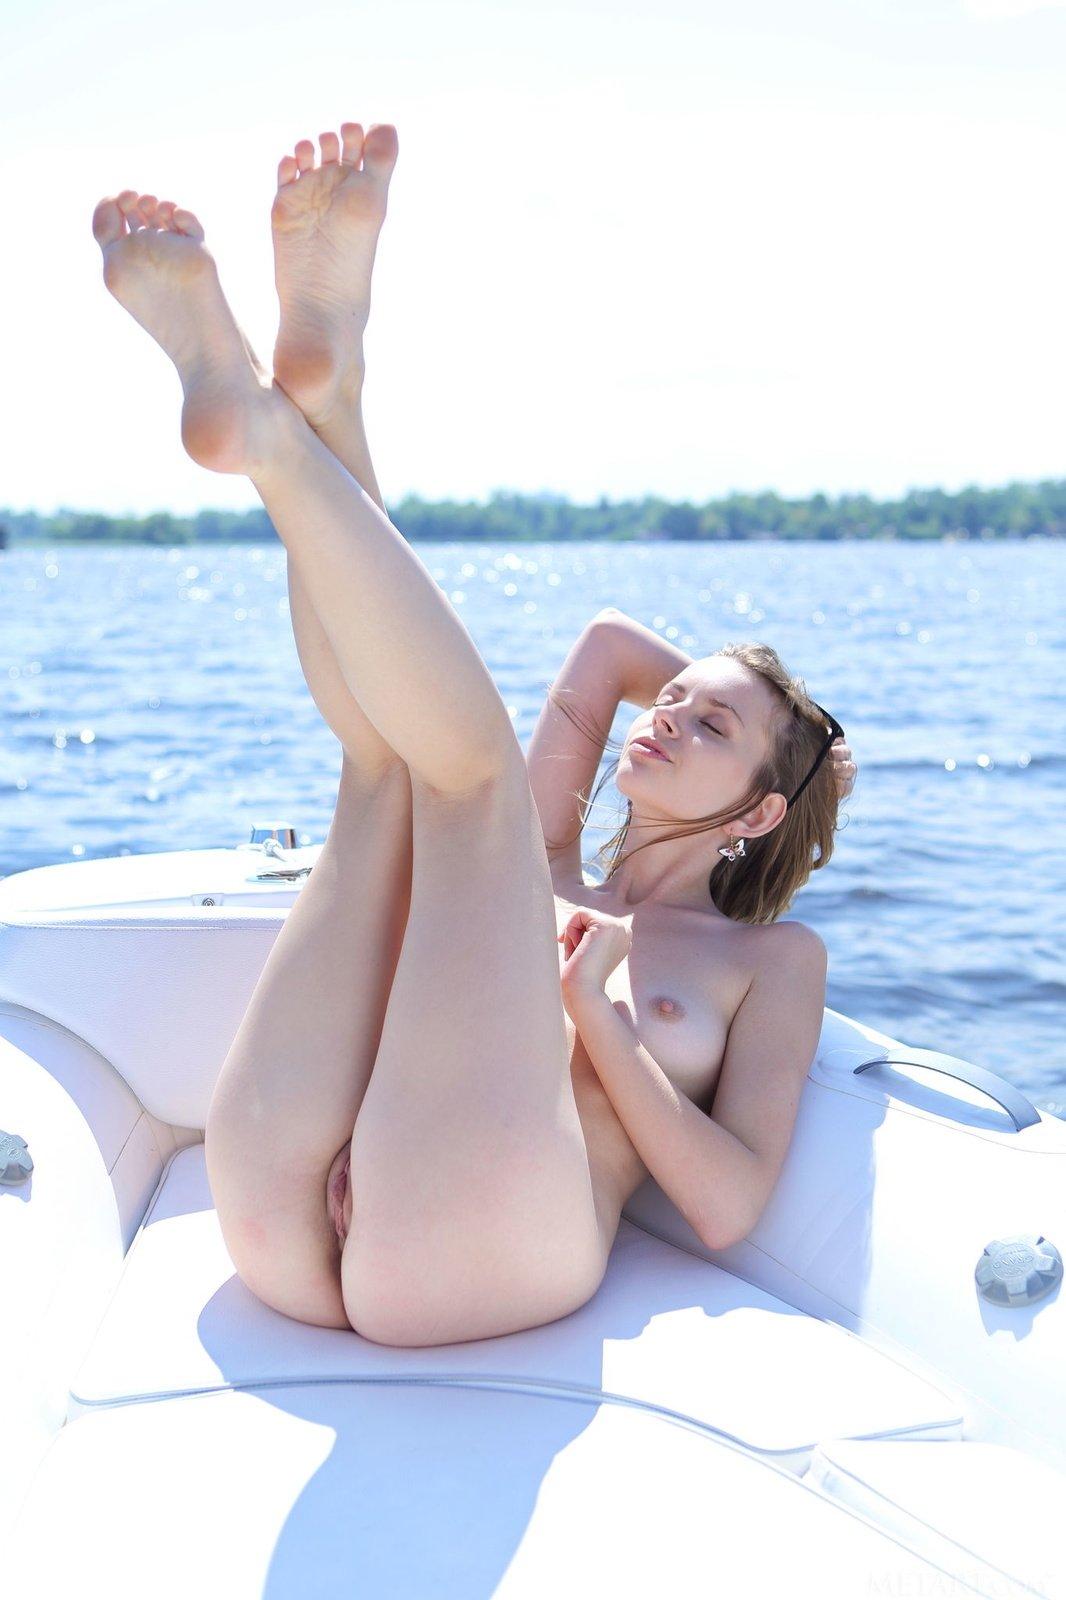 На яхте - Порно фото галерея 1038621